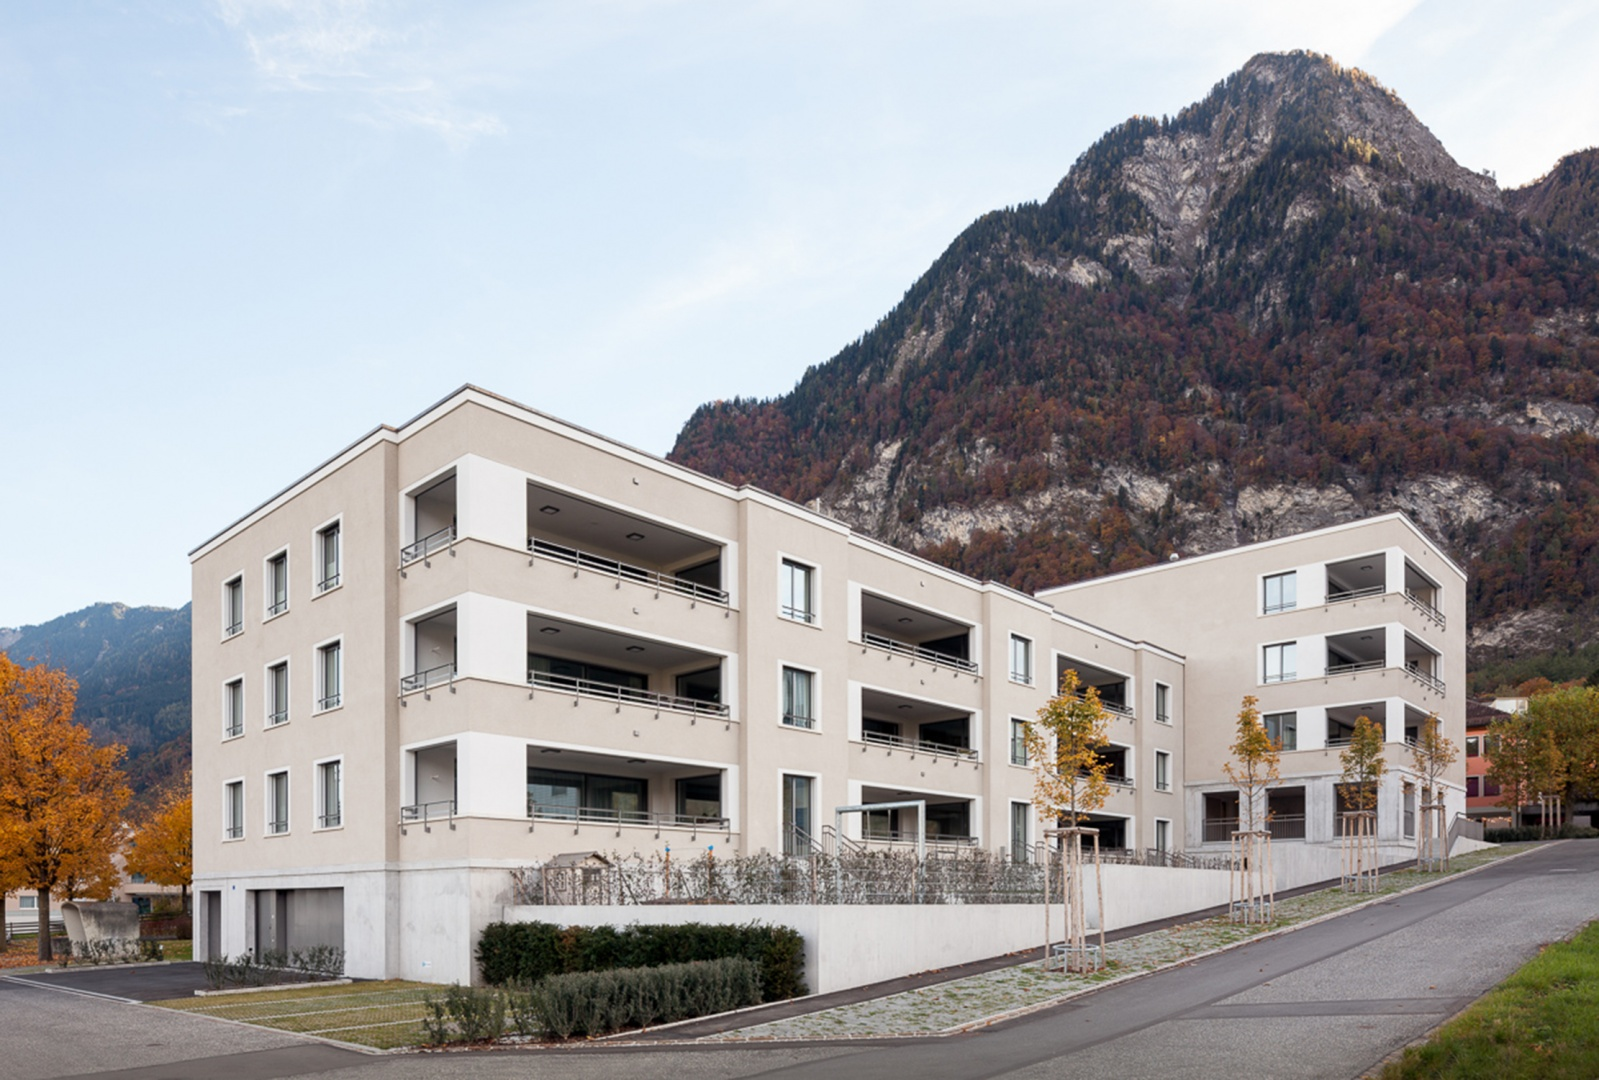 Neubau mehrfamilienhaus lehenwies documentation suisse for Mehrfamilienhaus neubau